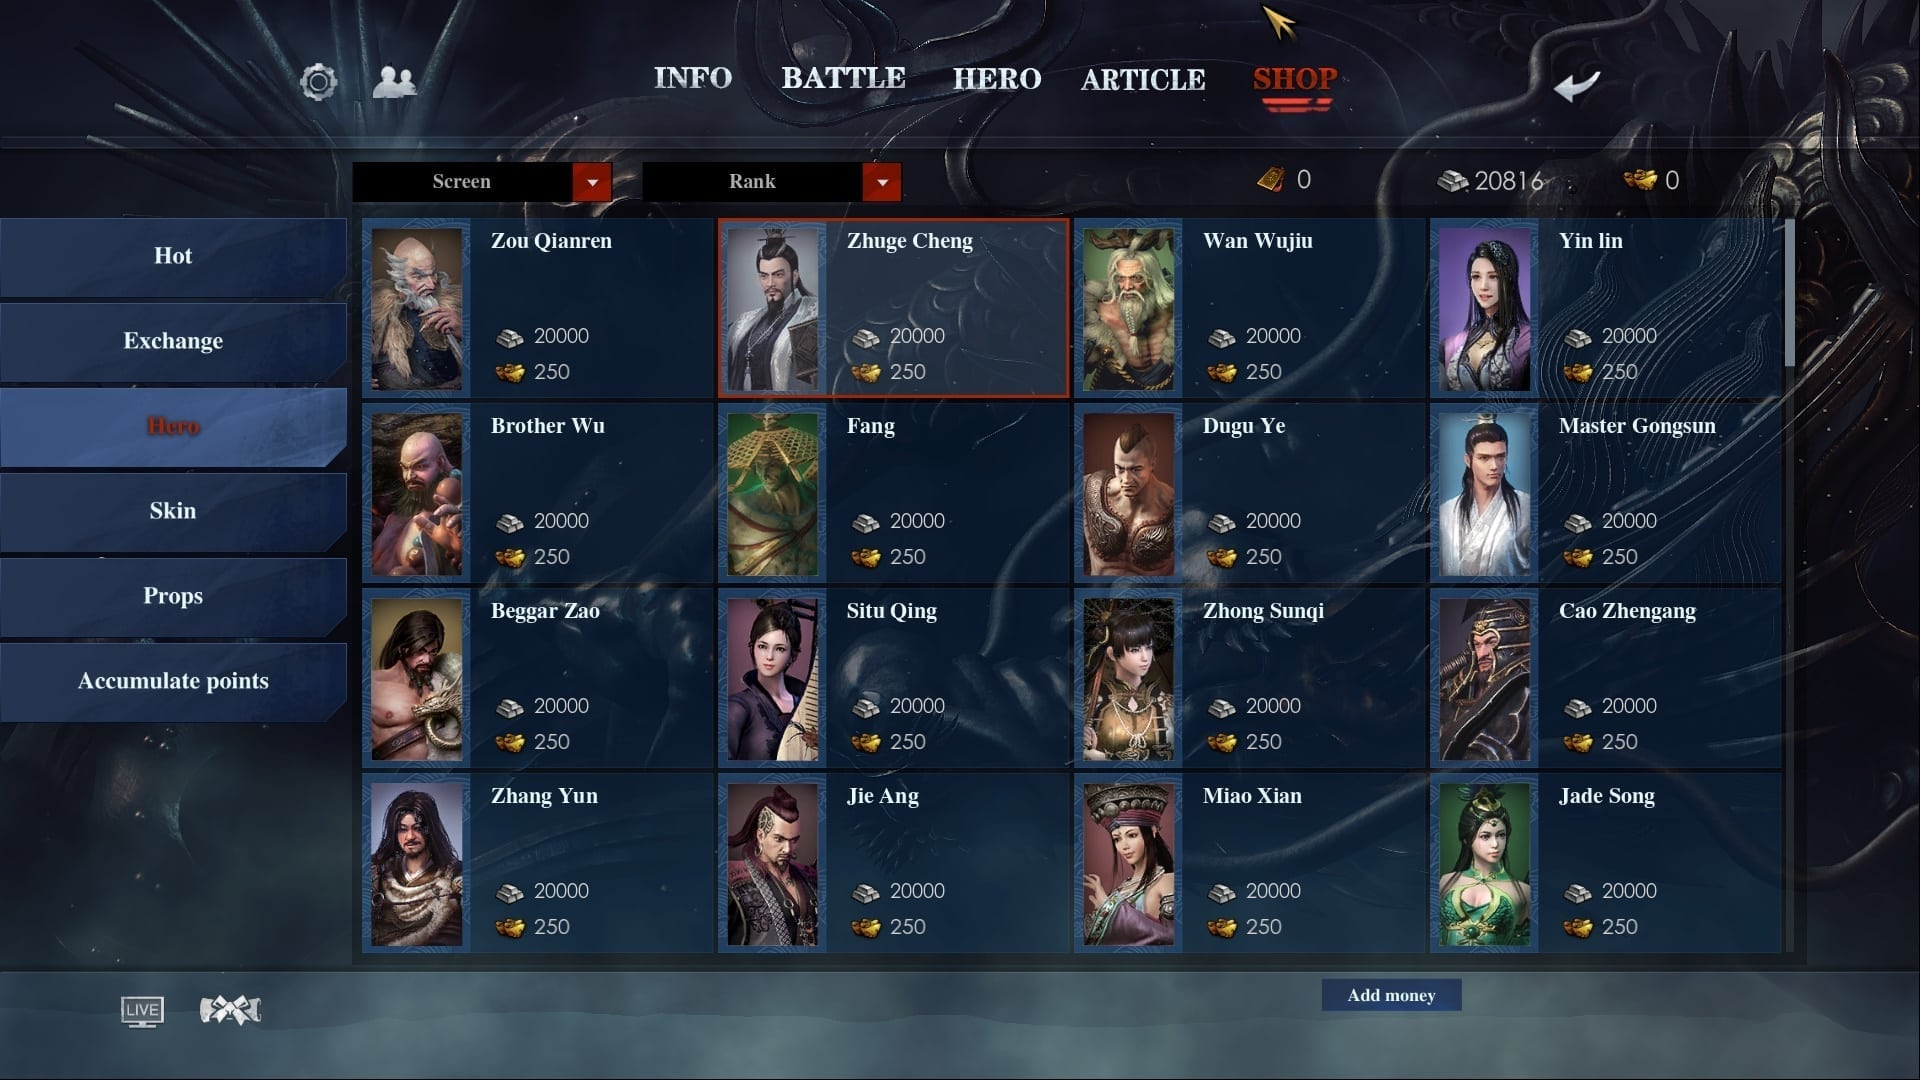 King of Wushu shop character list